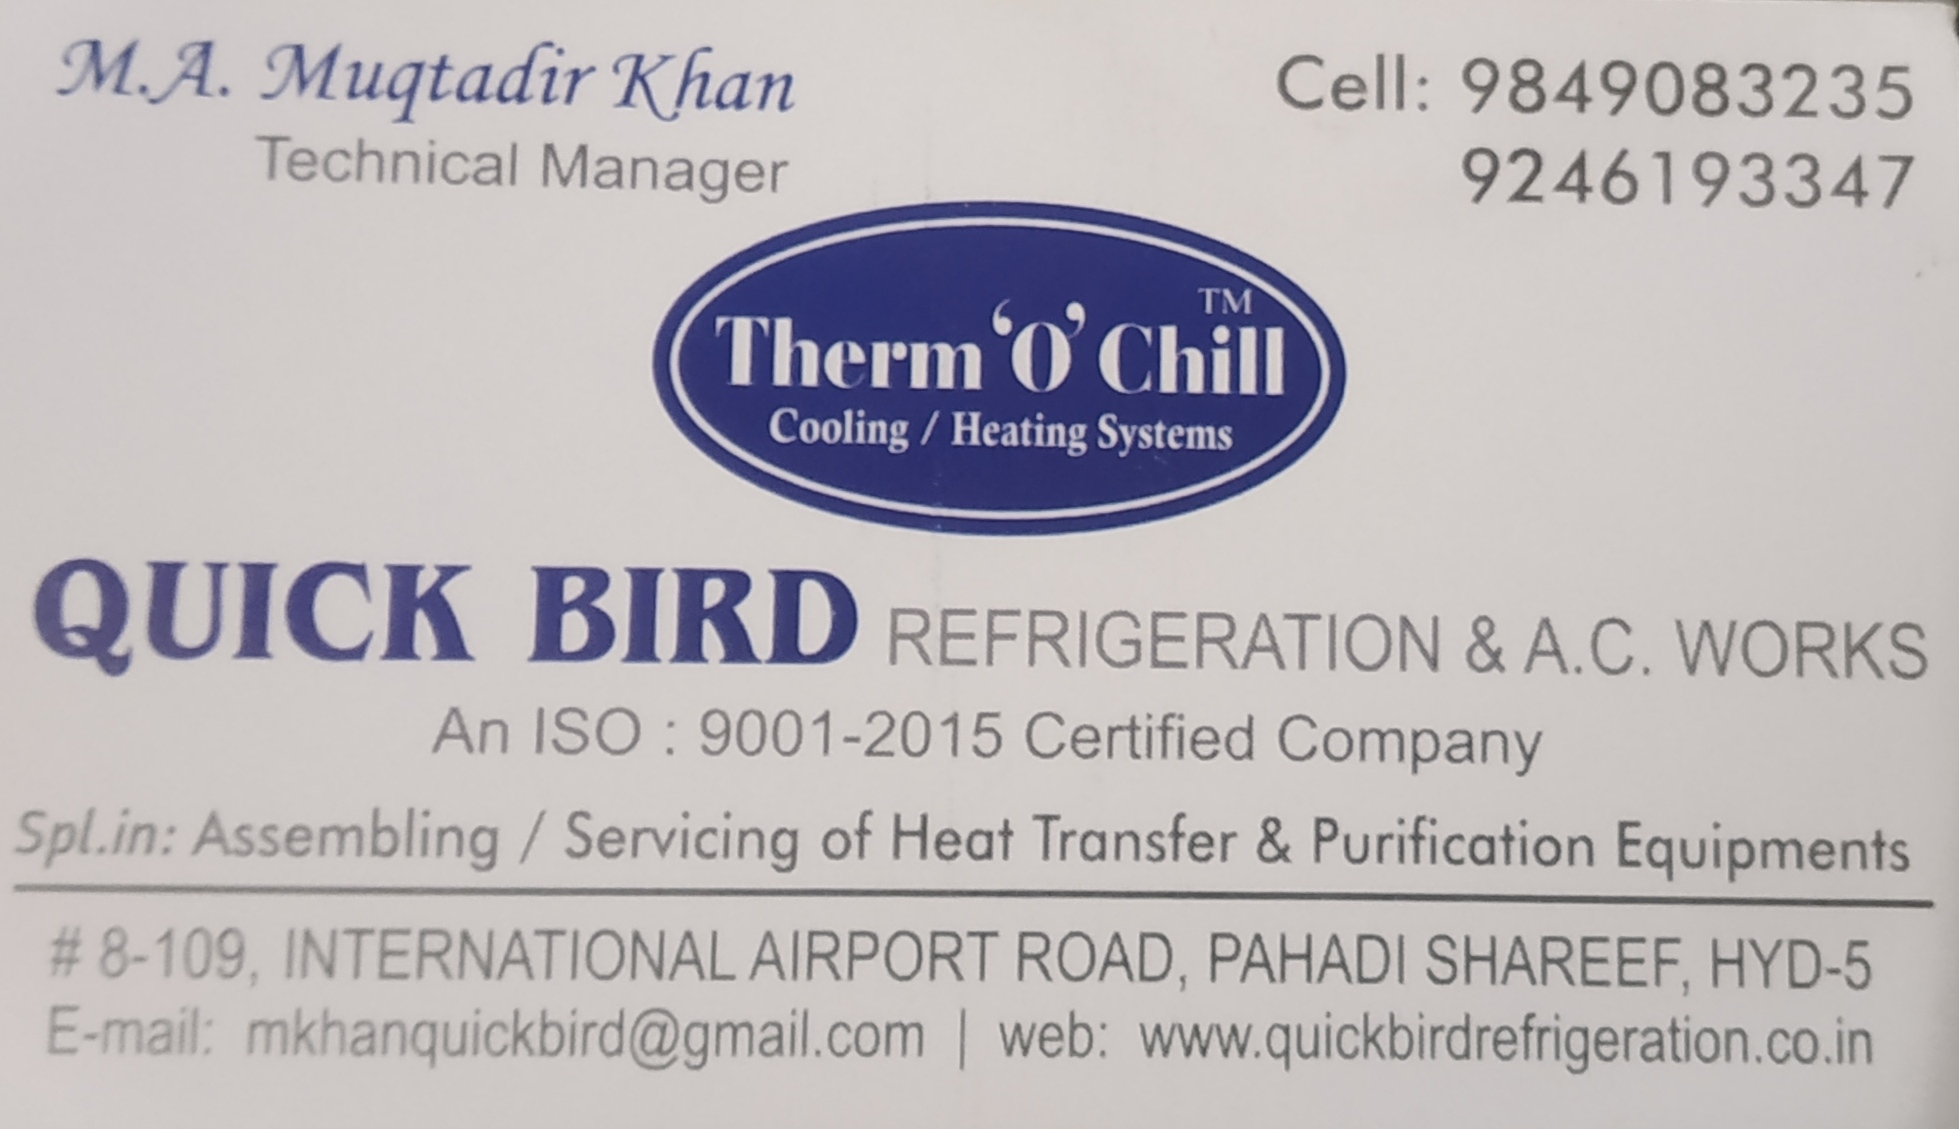 QUICK BIRD REFRIGERATION & A.C WORKS